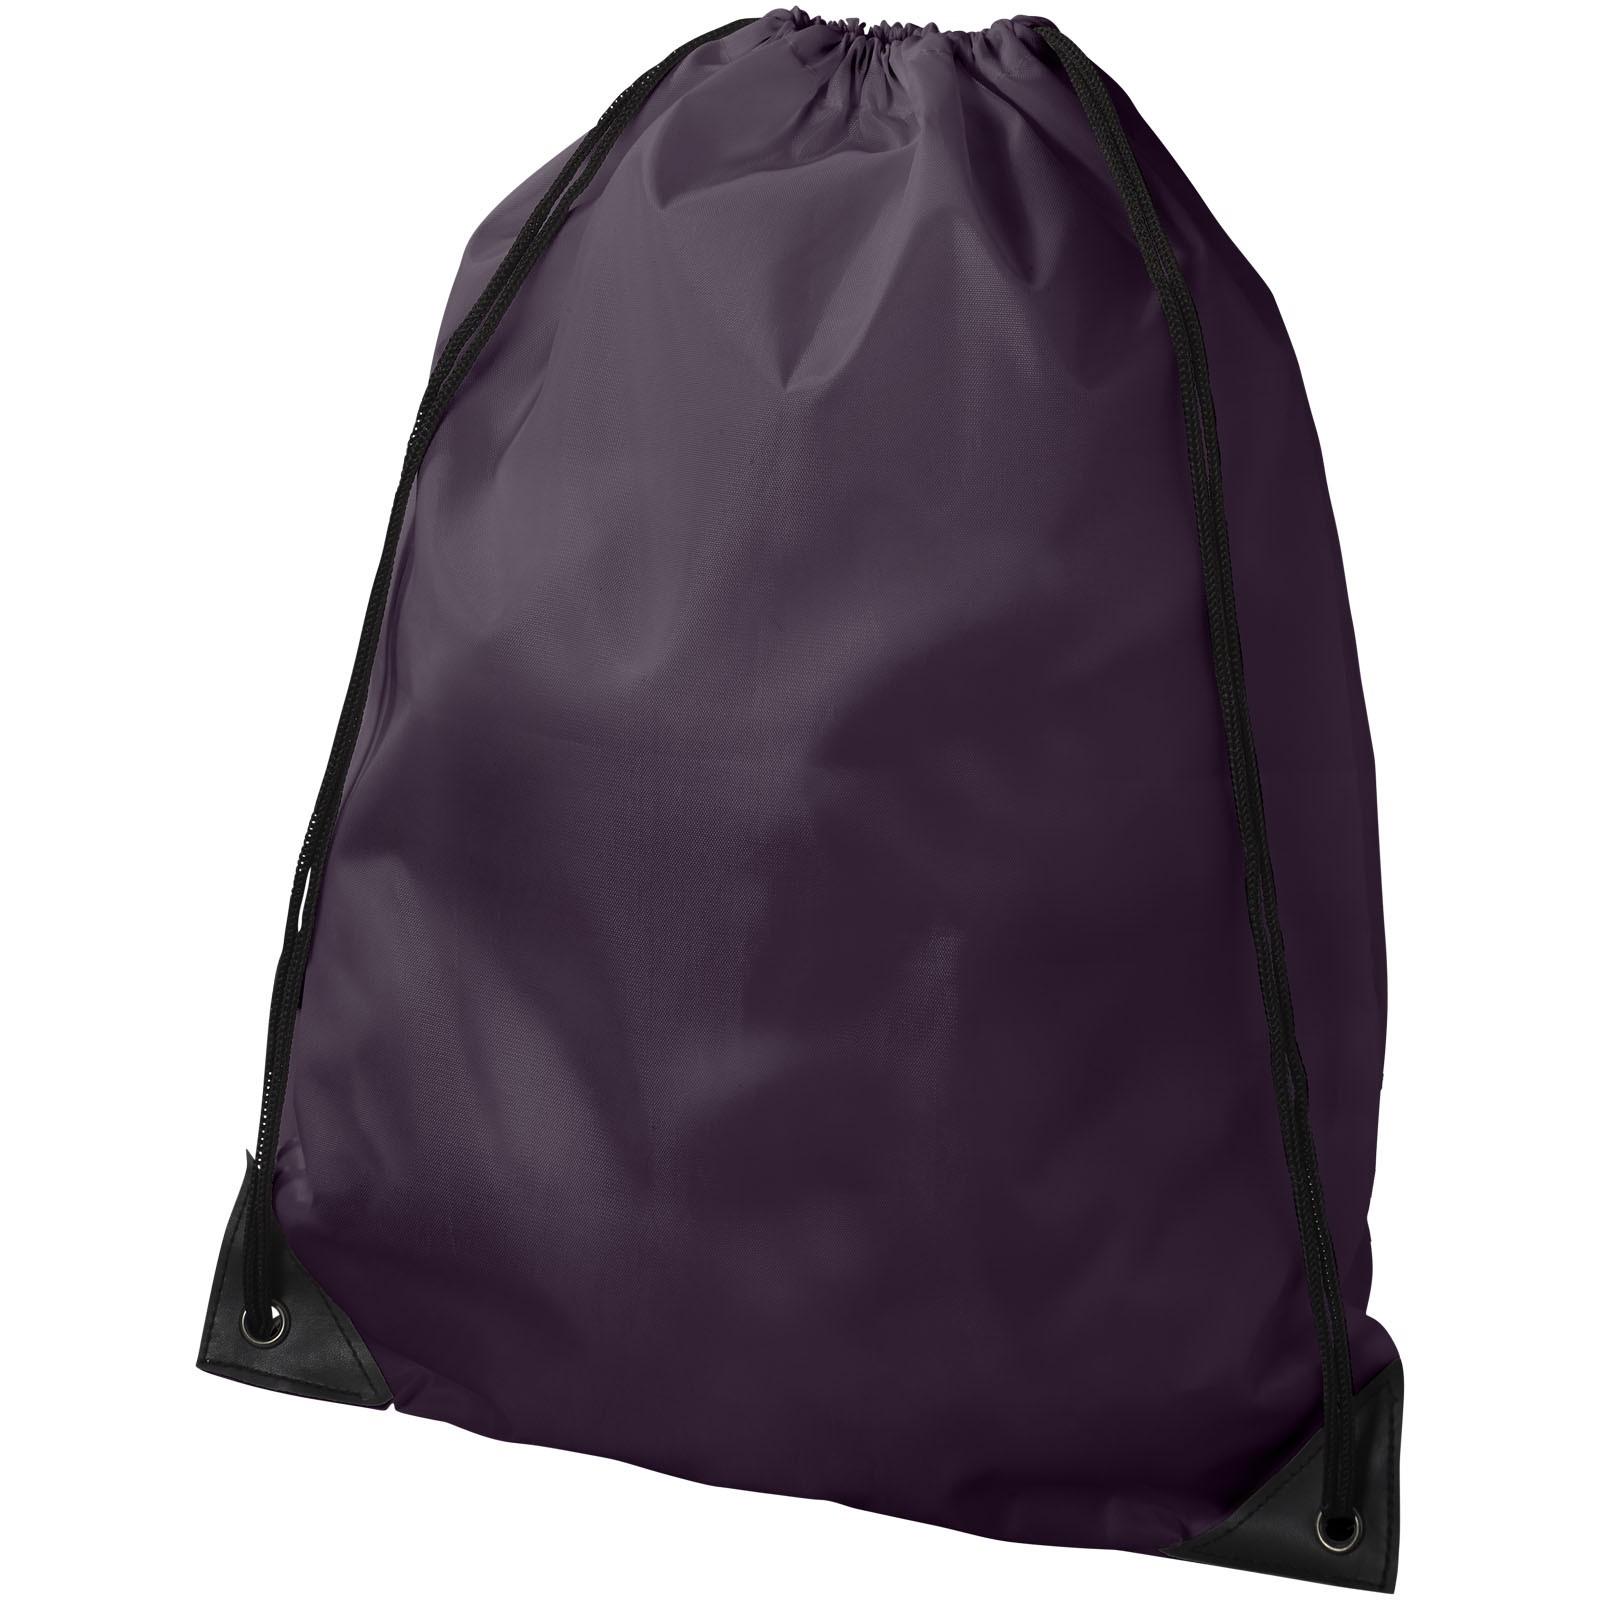 Oriole premium drawstring backpack - Plum